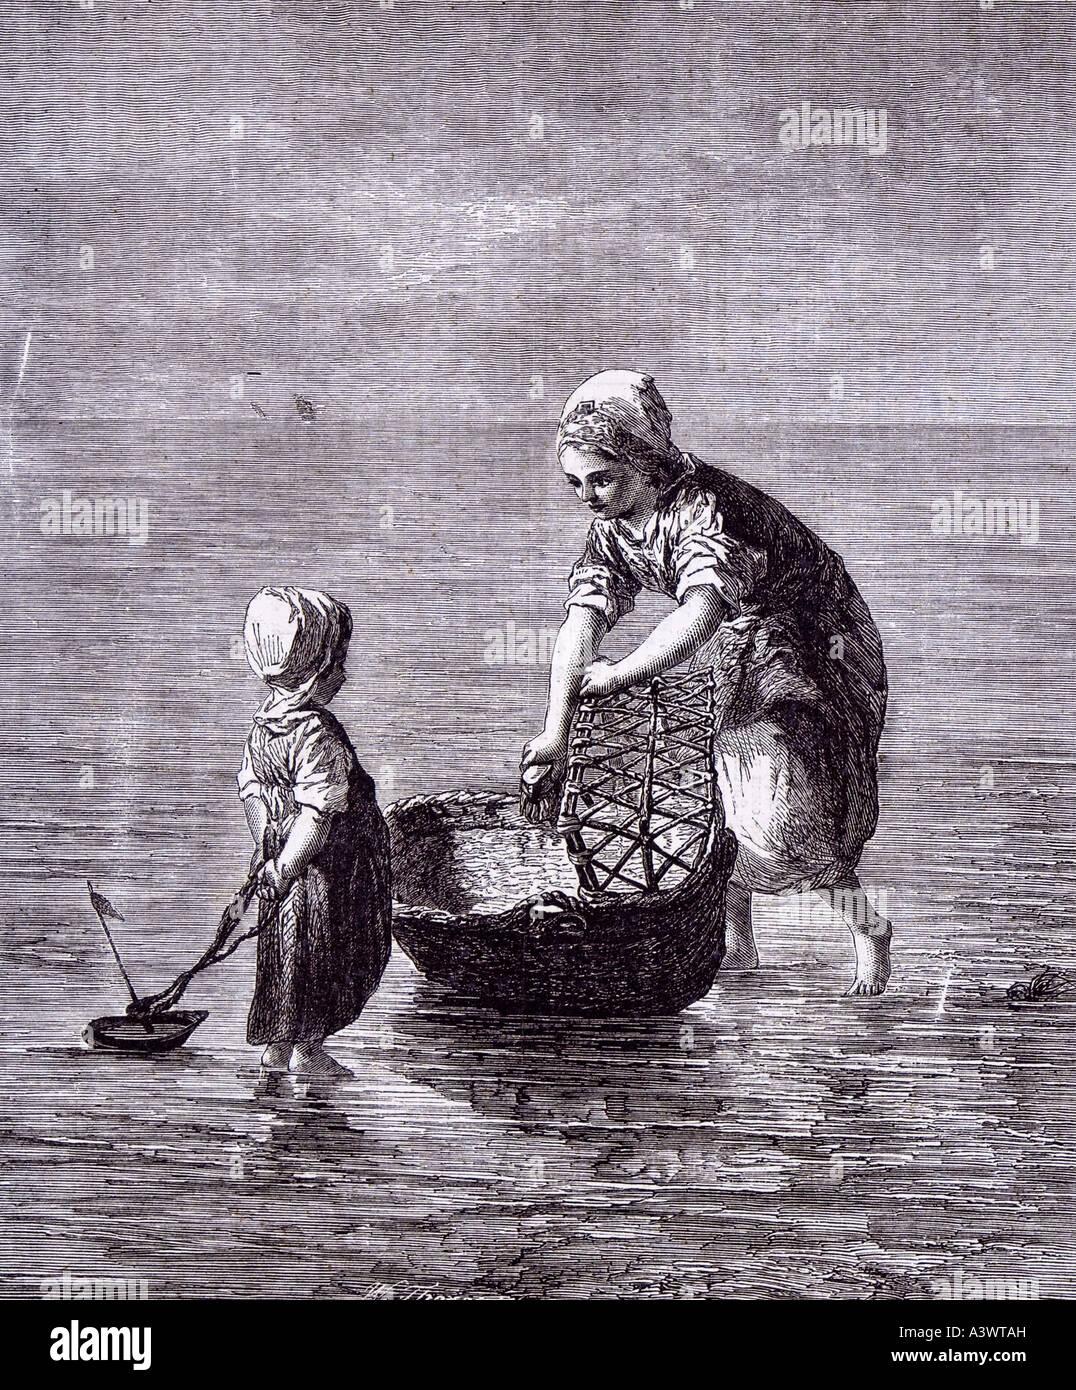 Baby cribs moses baskets - Dutch Artist Art Child Sister Sea Boat Moses Basket Baby Bed Cot Crib Babyhood Stock